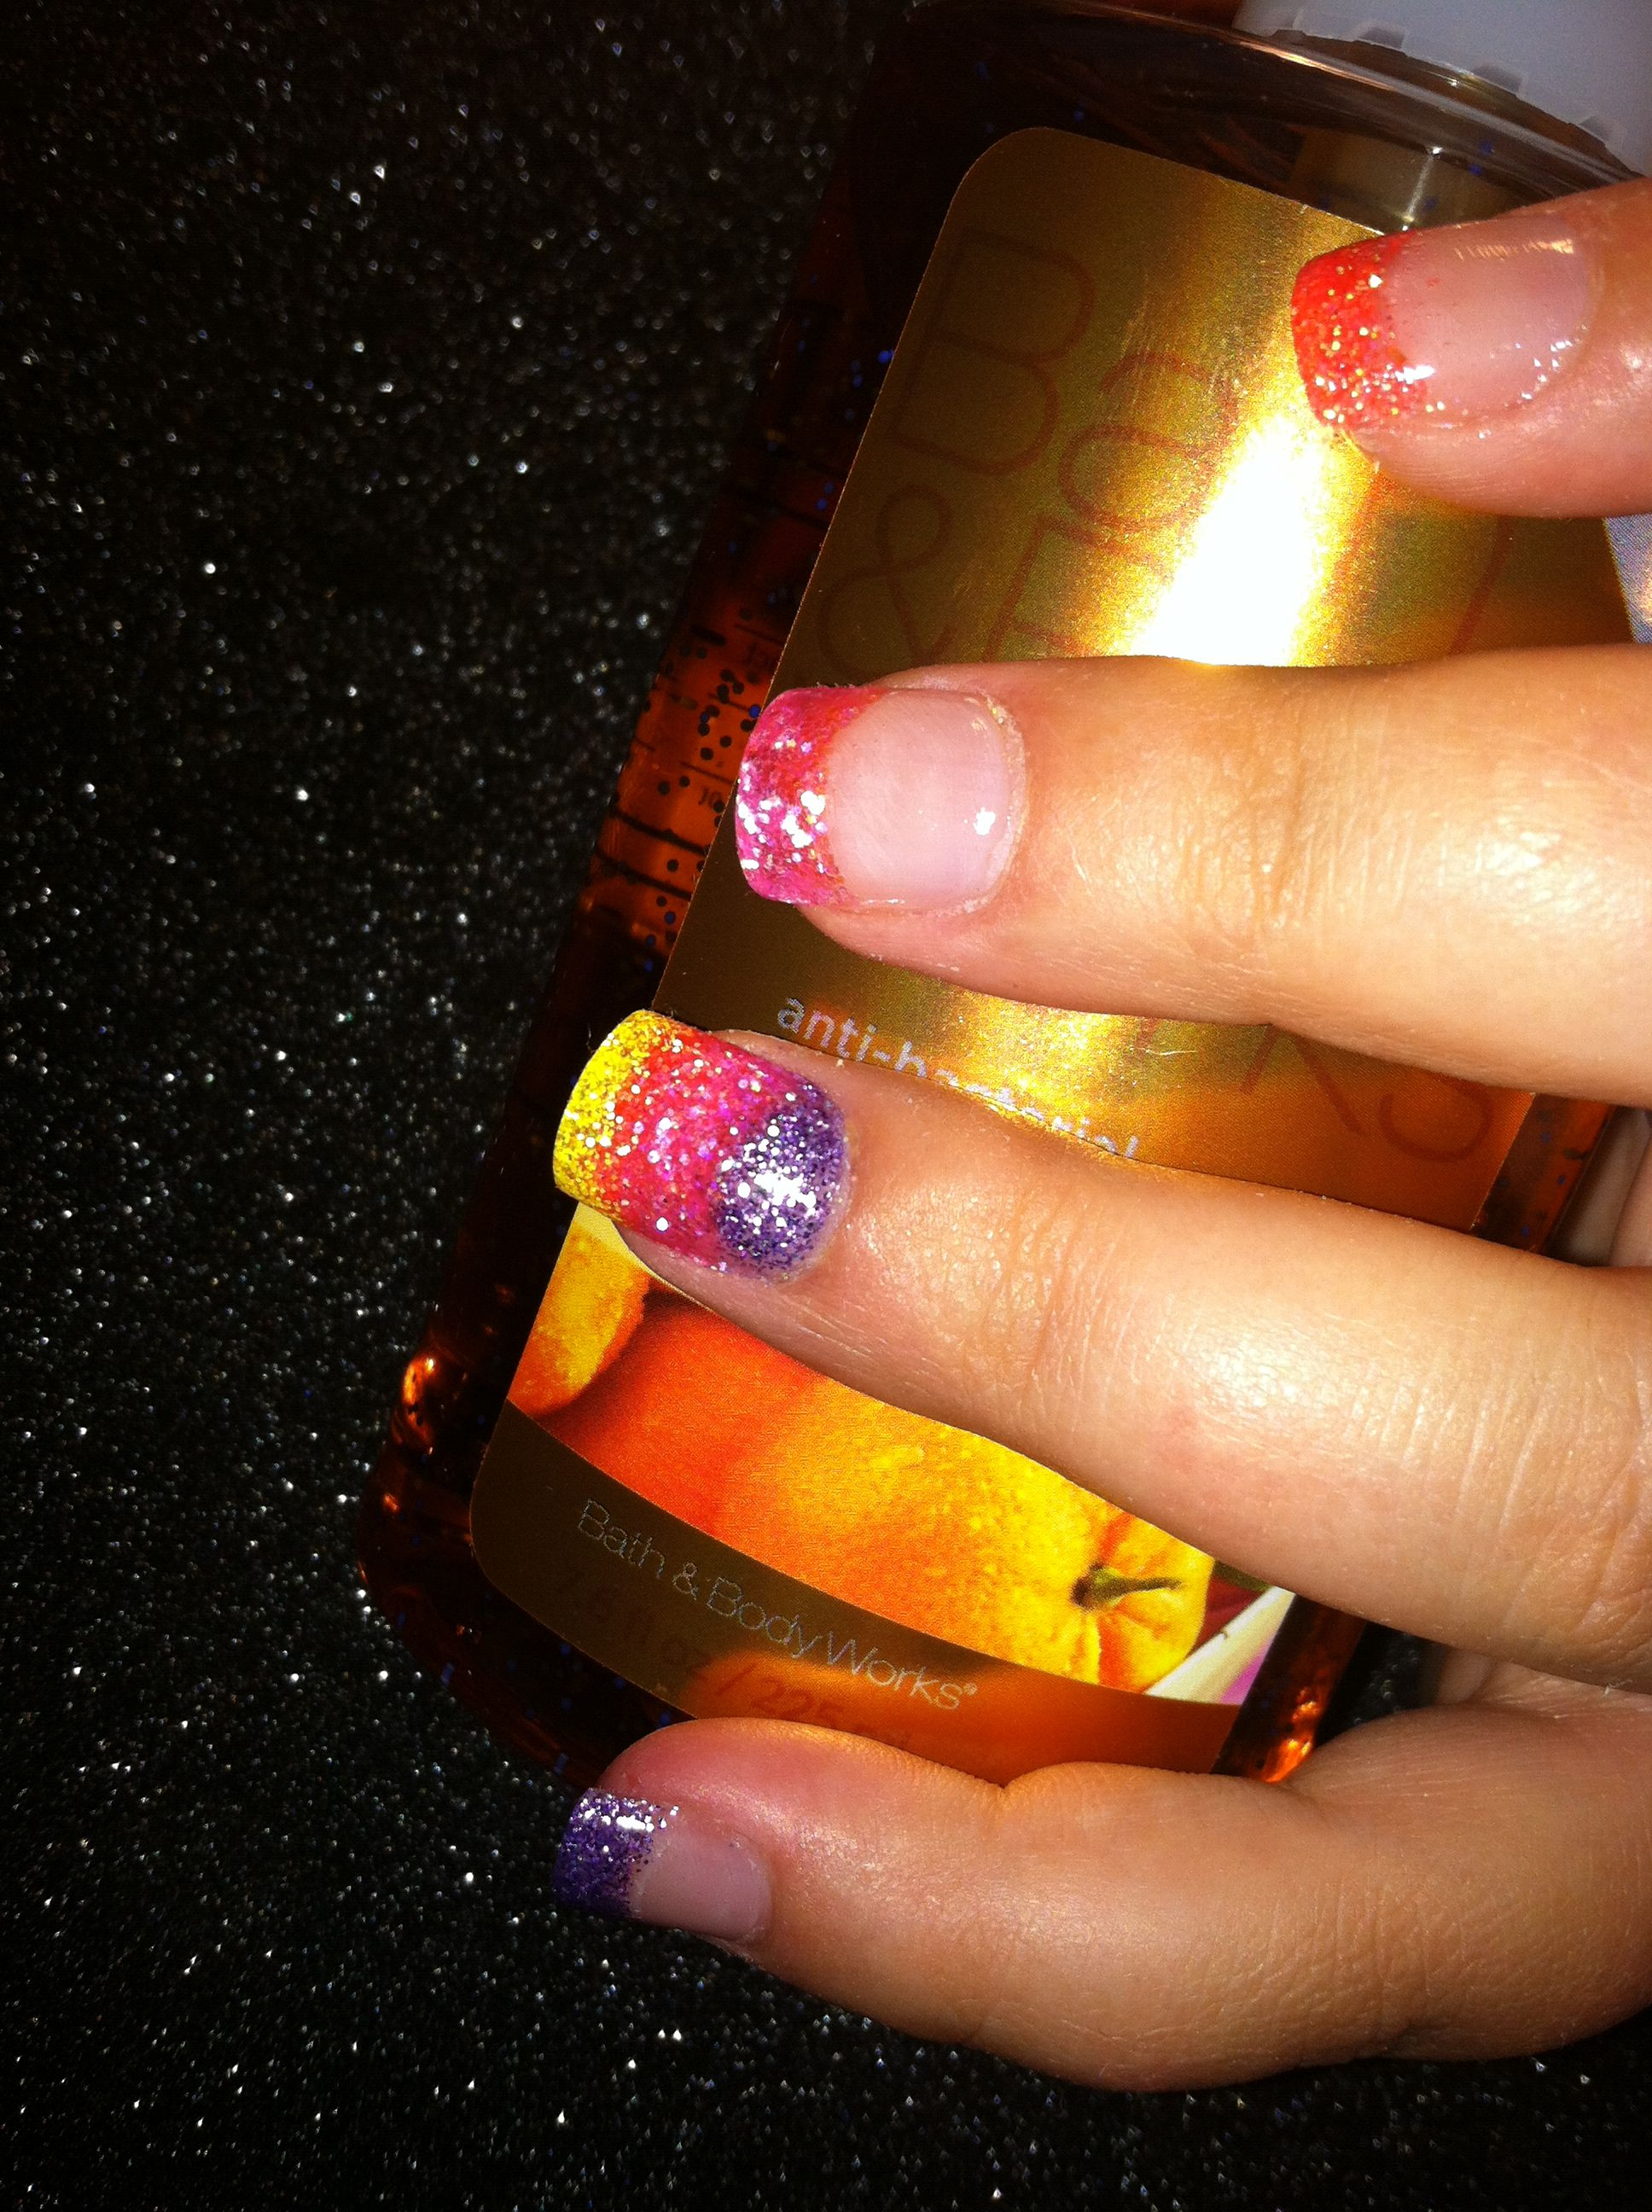 Neon acrylic rainbow French manicure nails. | Manicure ...